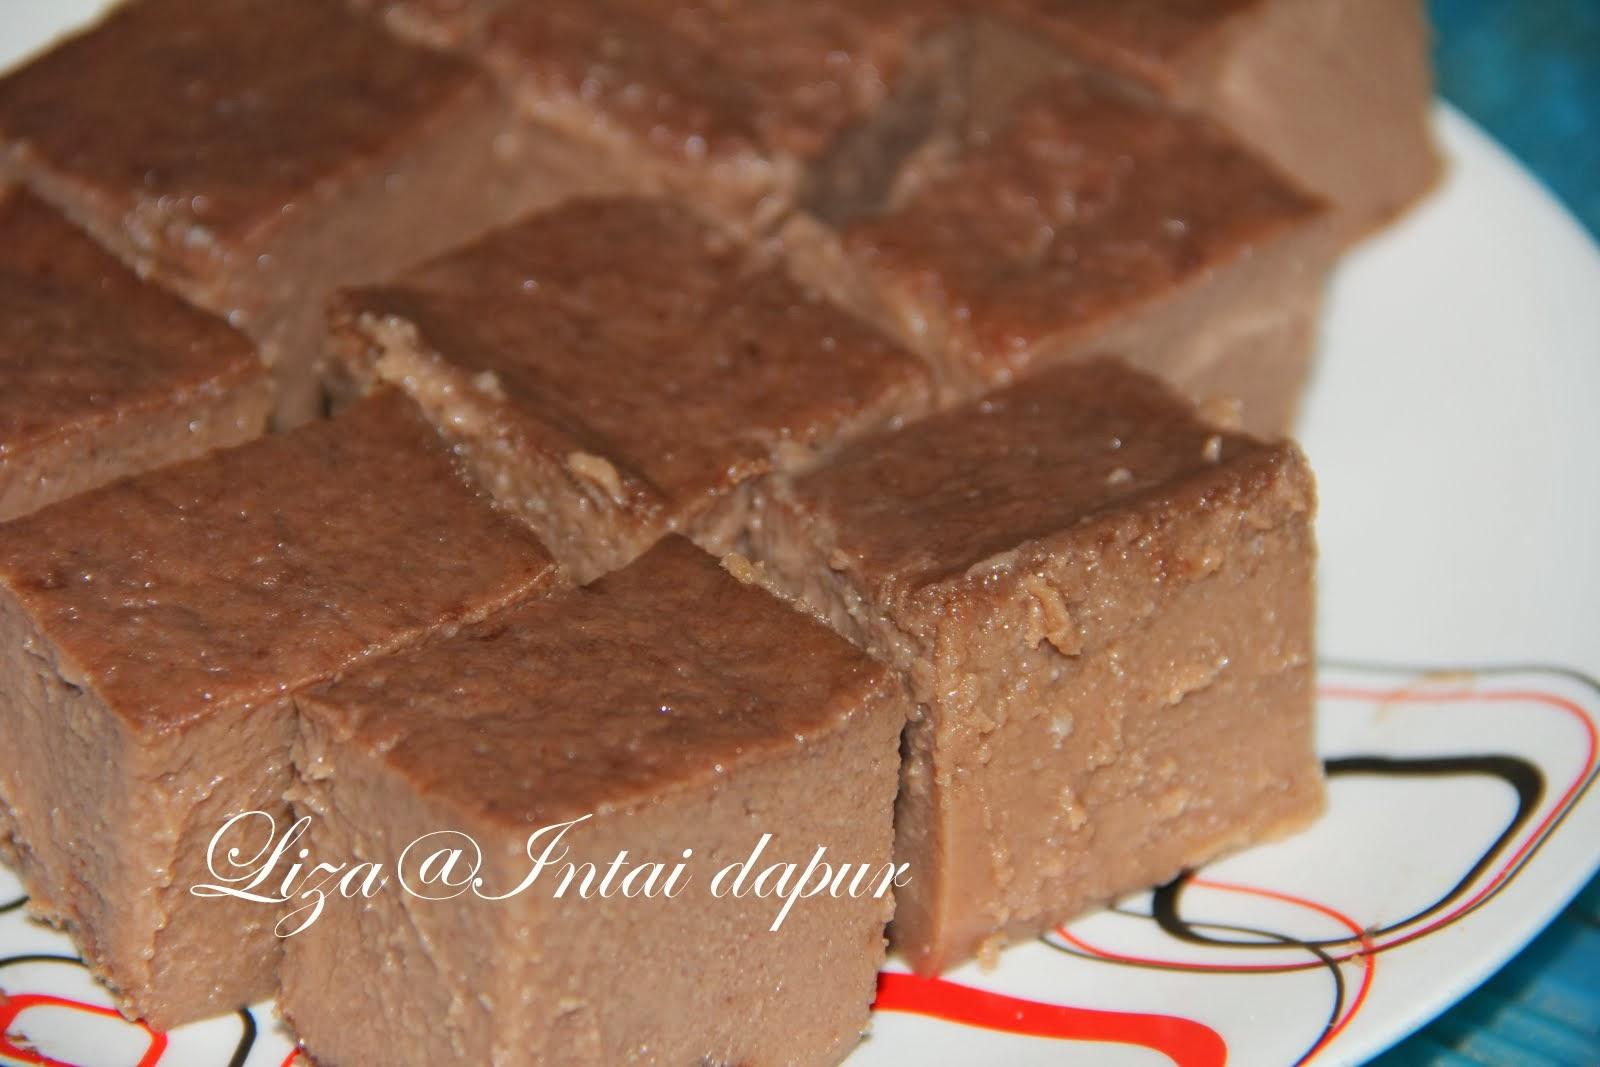 INTAI DAPUR: Bingka Roti Coklat...